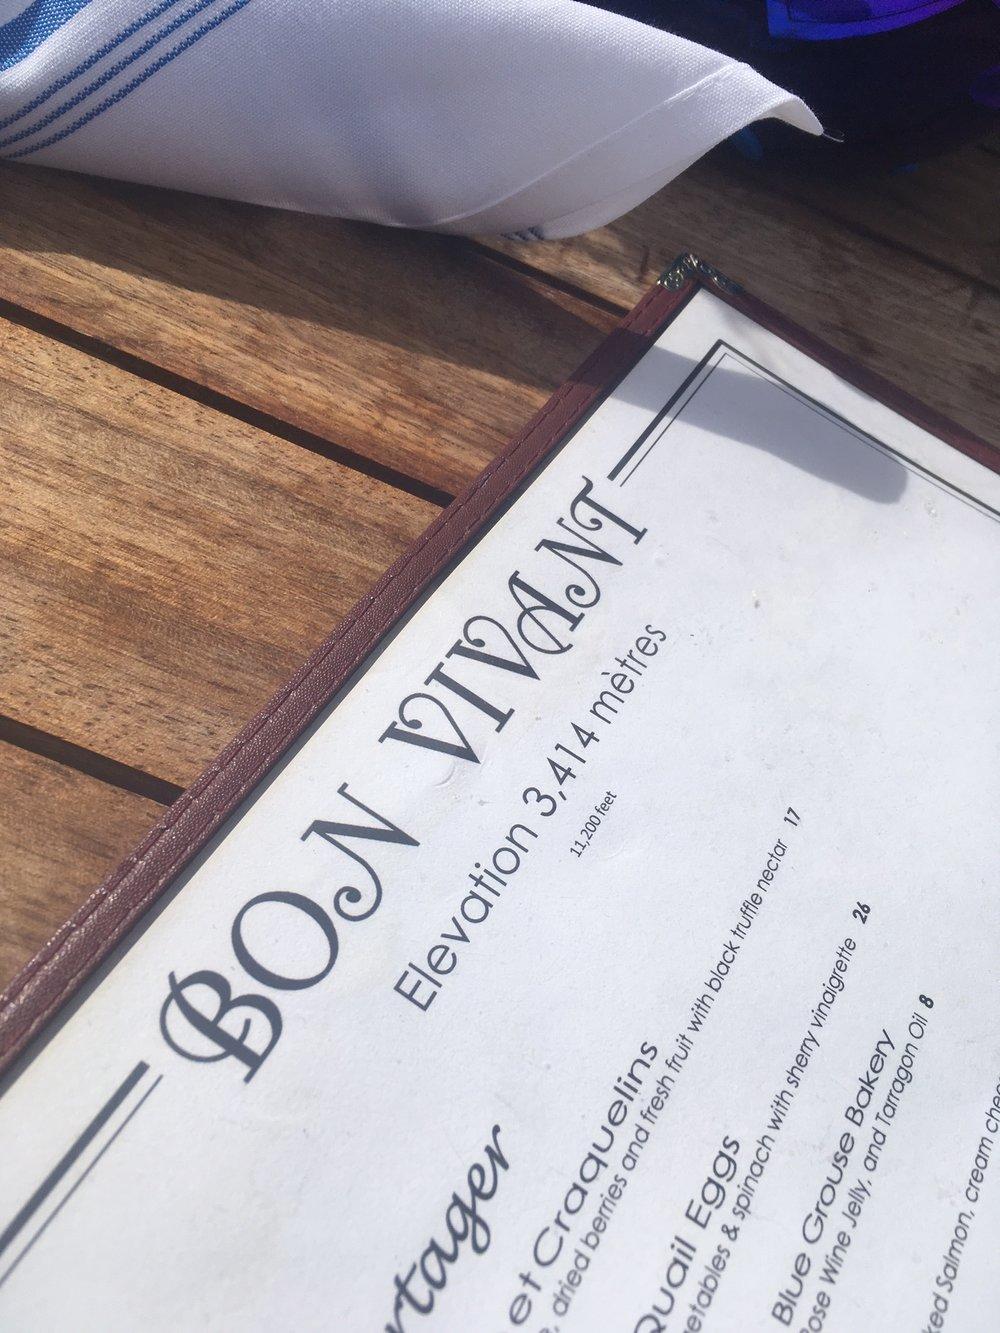 bon vivant menu.JPG